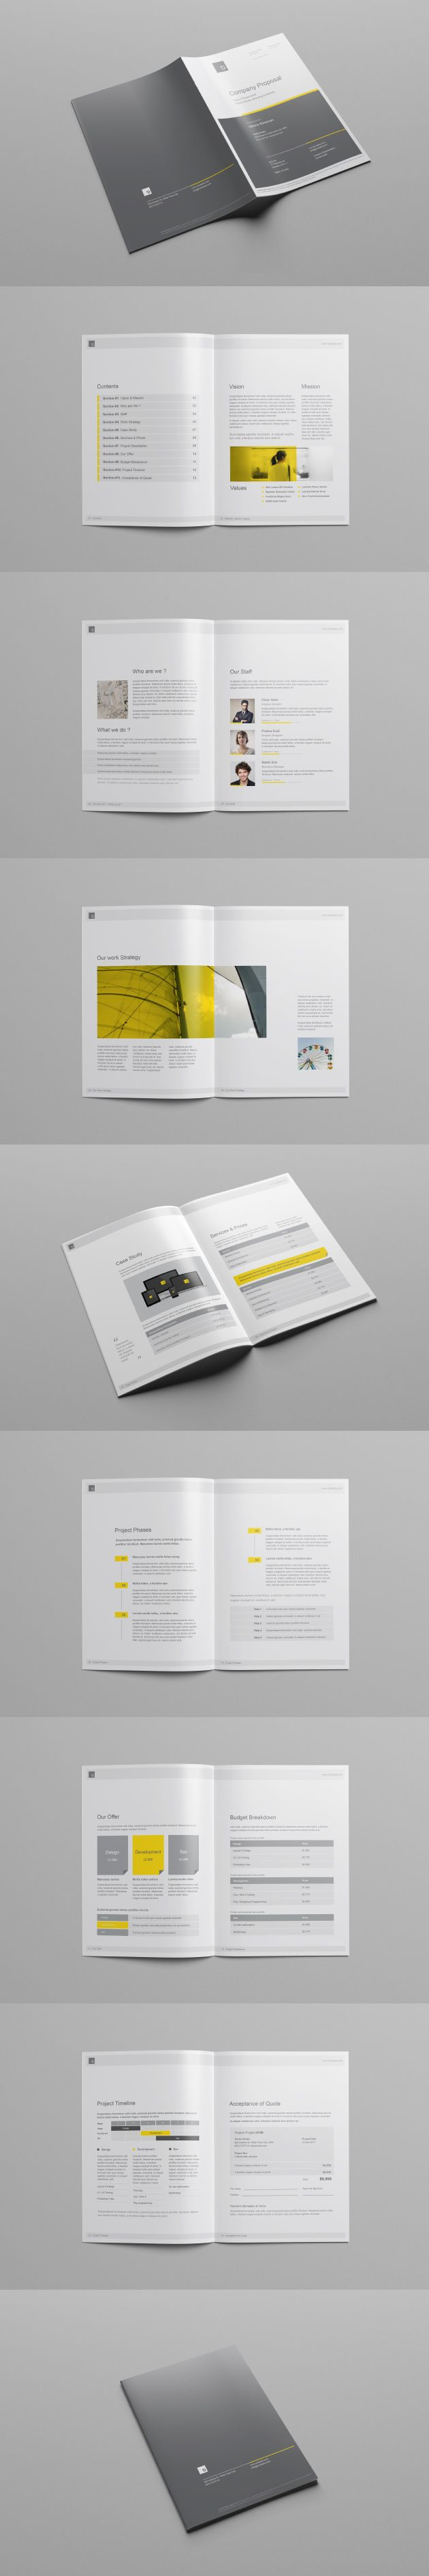 Company Proposal Template Design